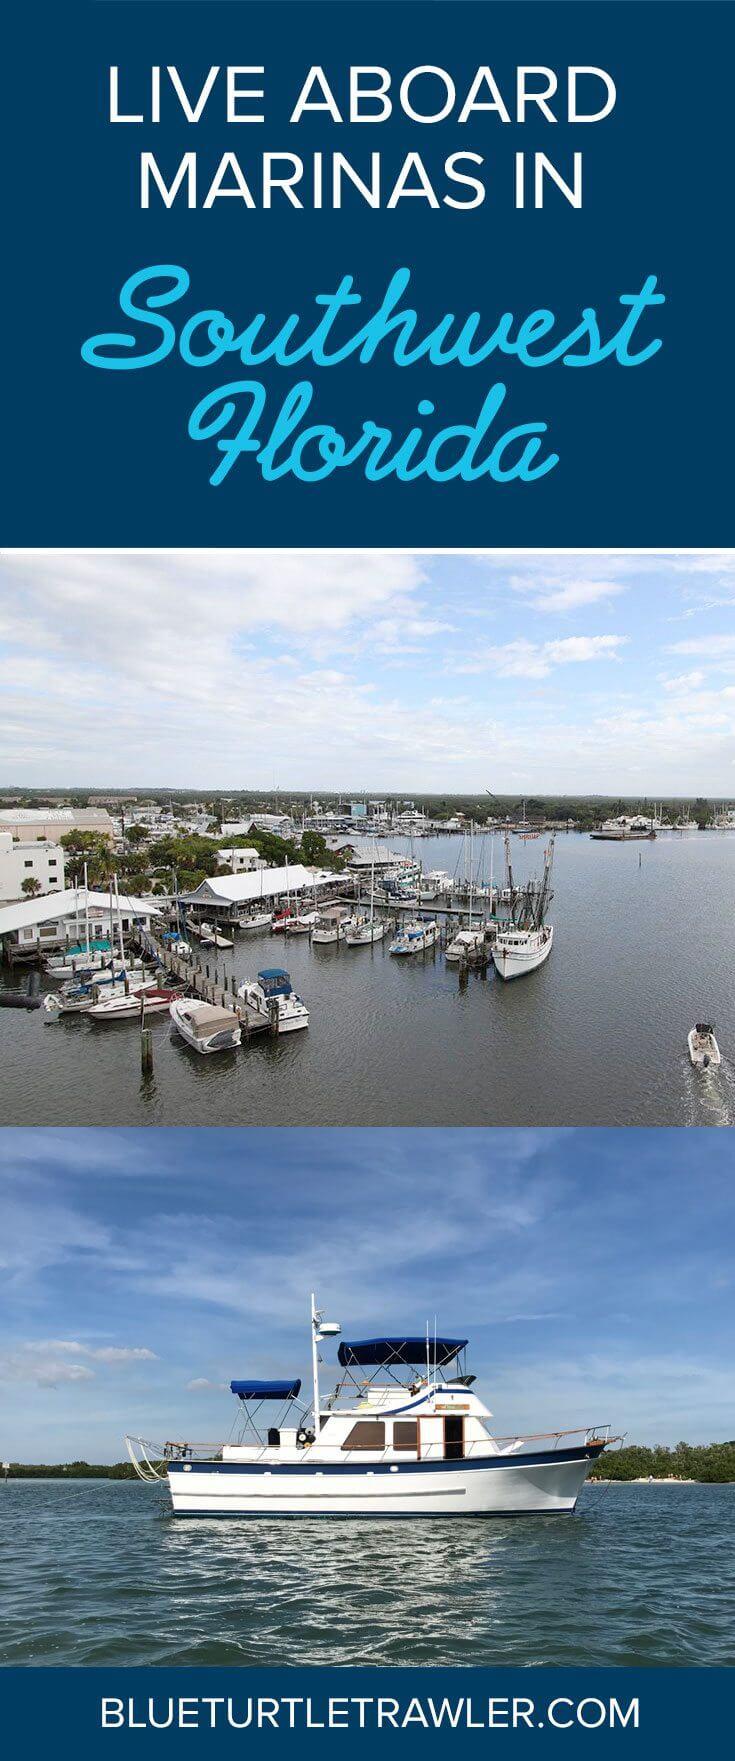 live aboard marinas in southwest florida